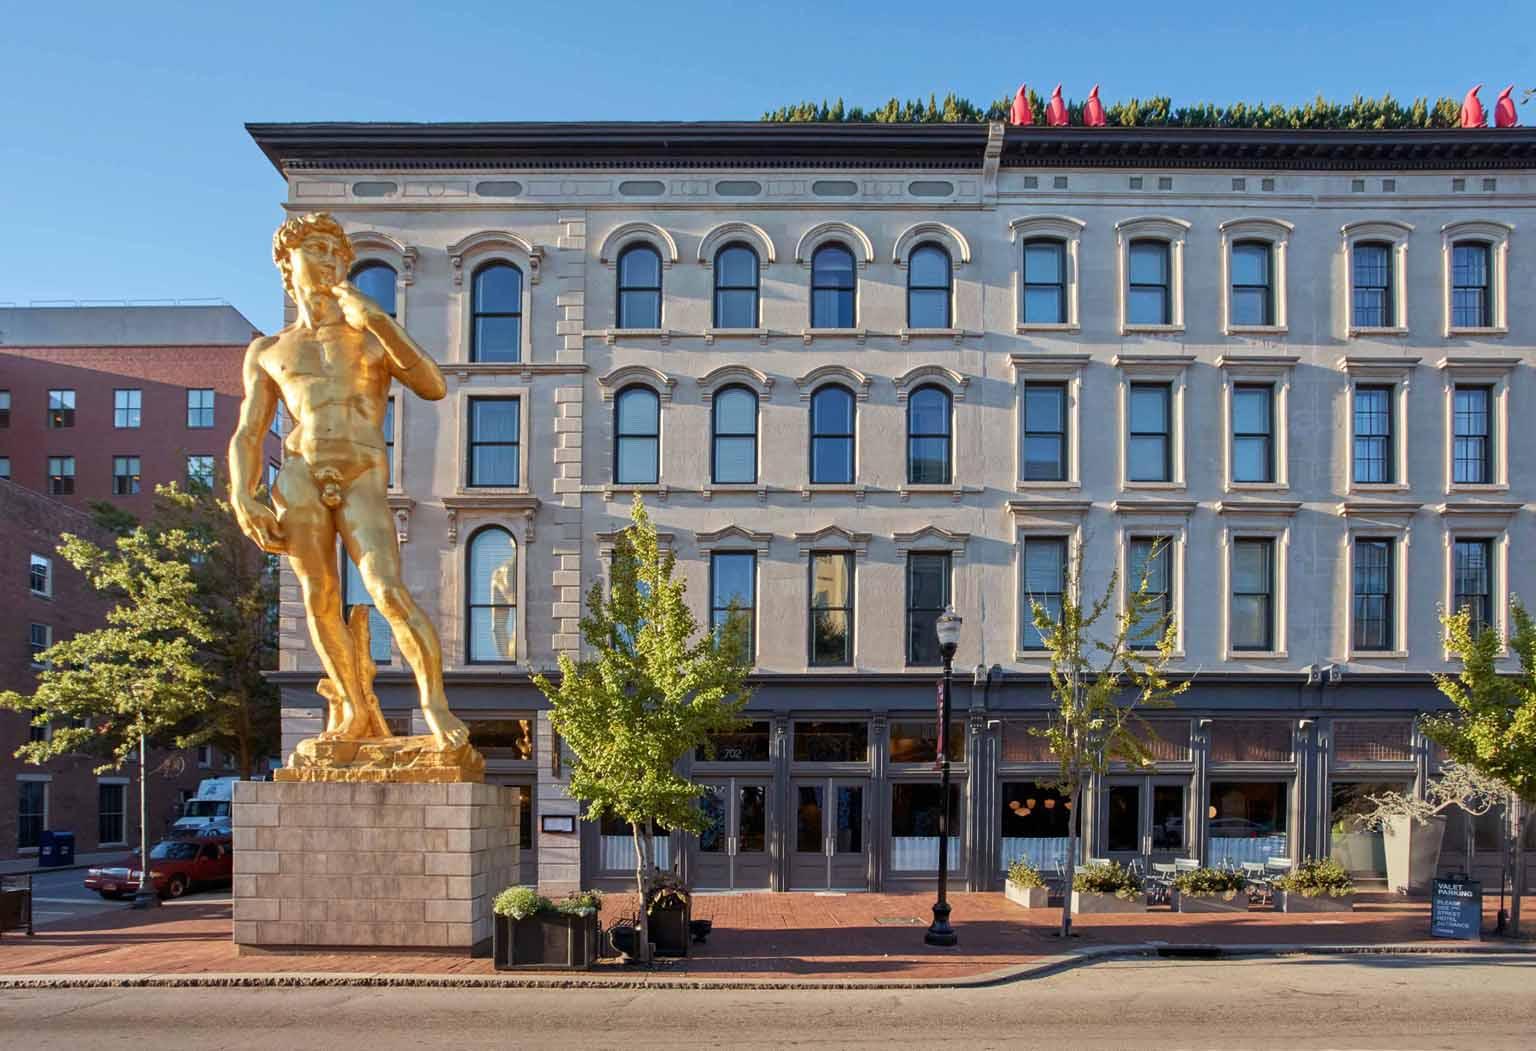 21c Museum Hotel – Louisville, KY